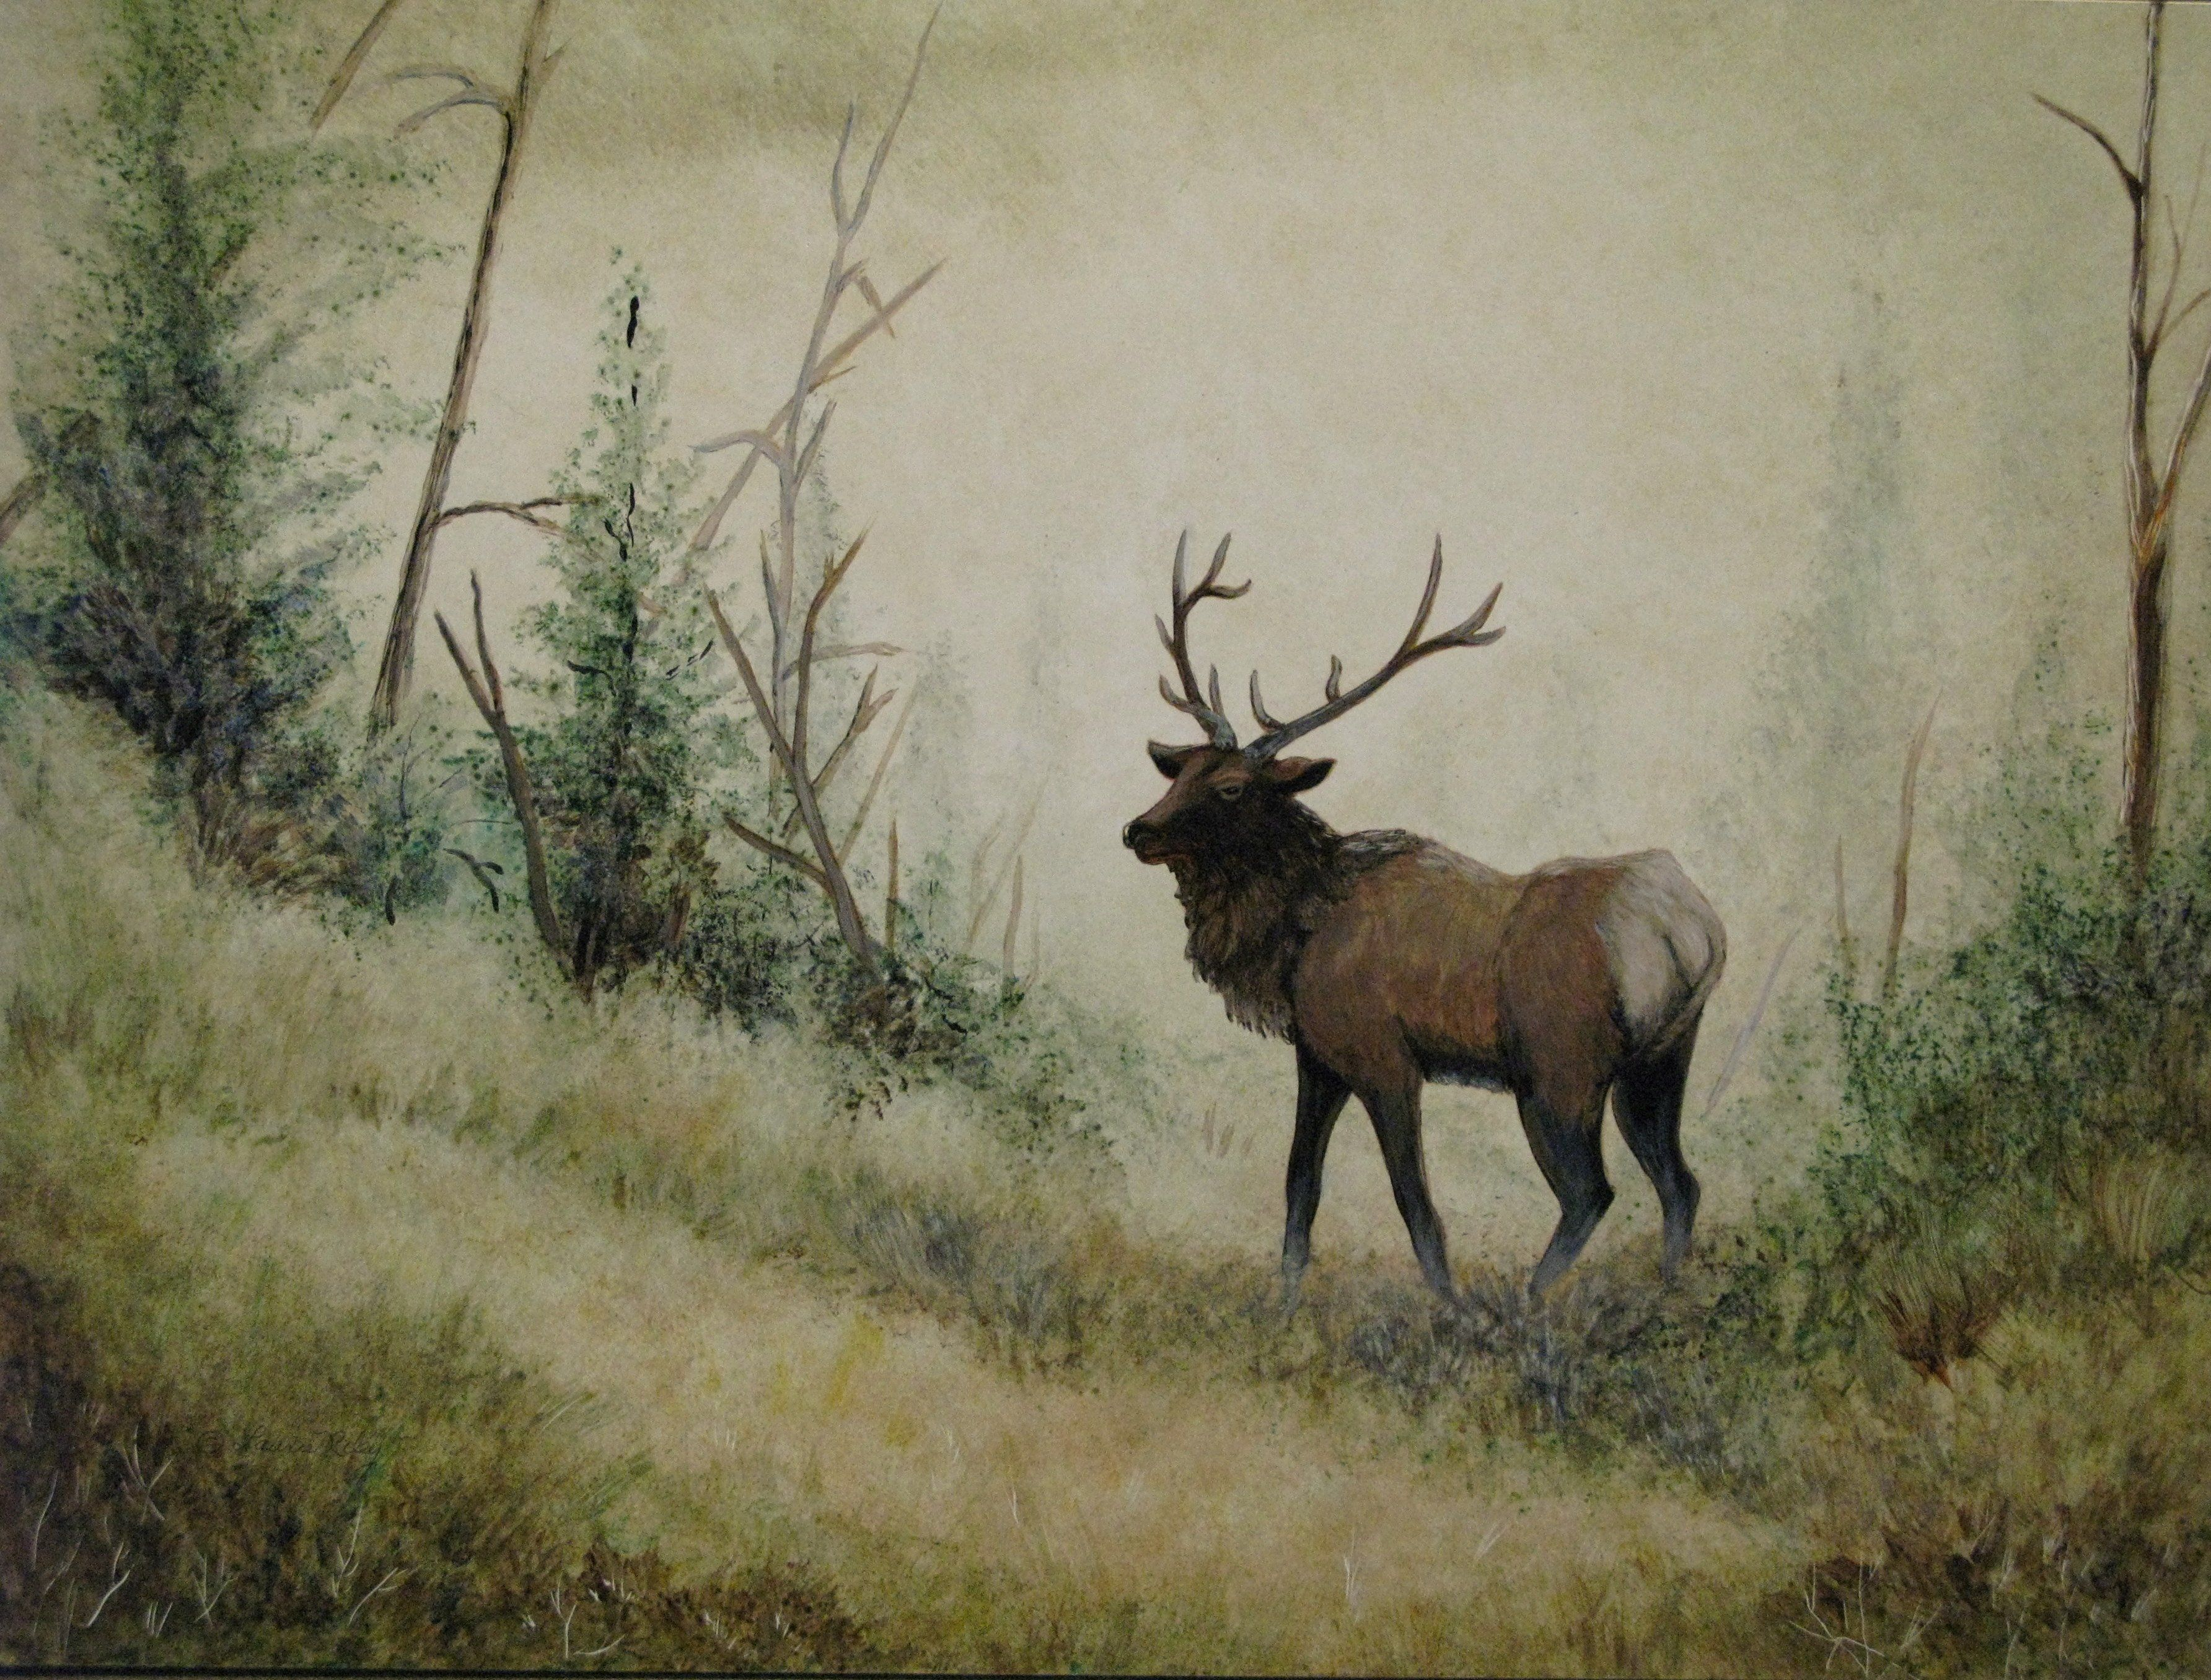 Elk Desktop Wallpapers - Top Free Elk